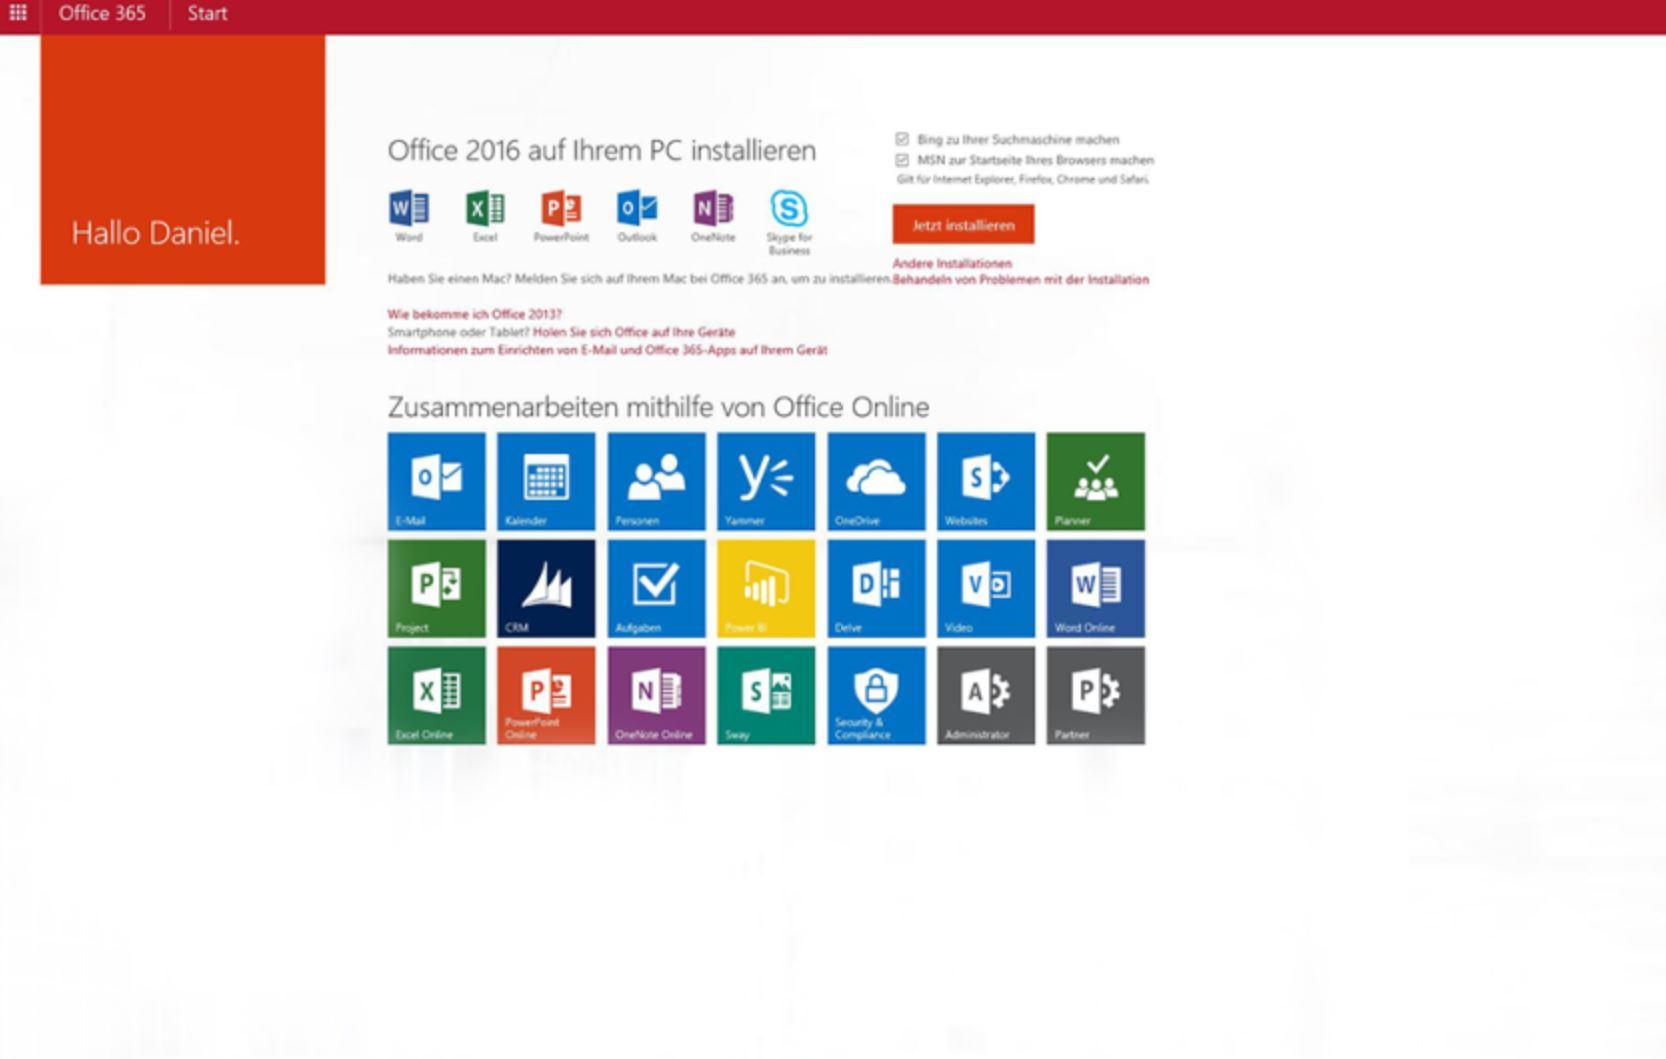 Microsoft Office_365_SAAS-Oberfläche_